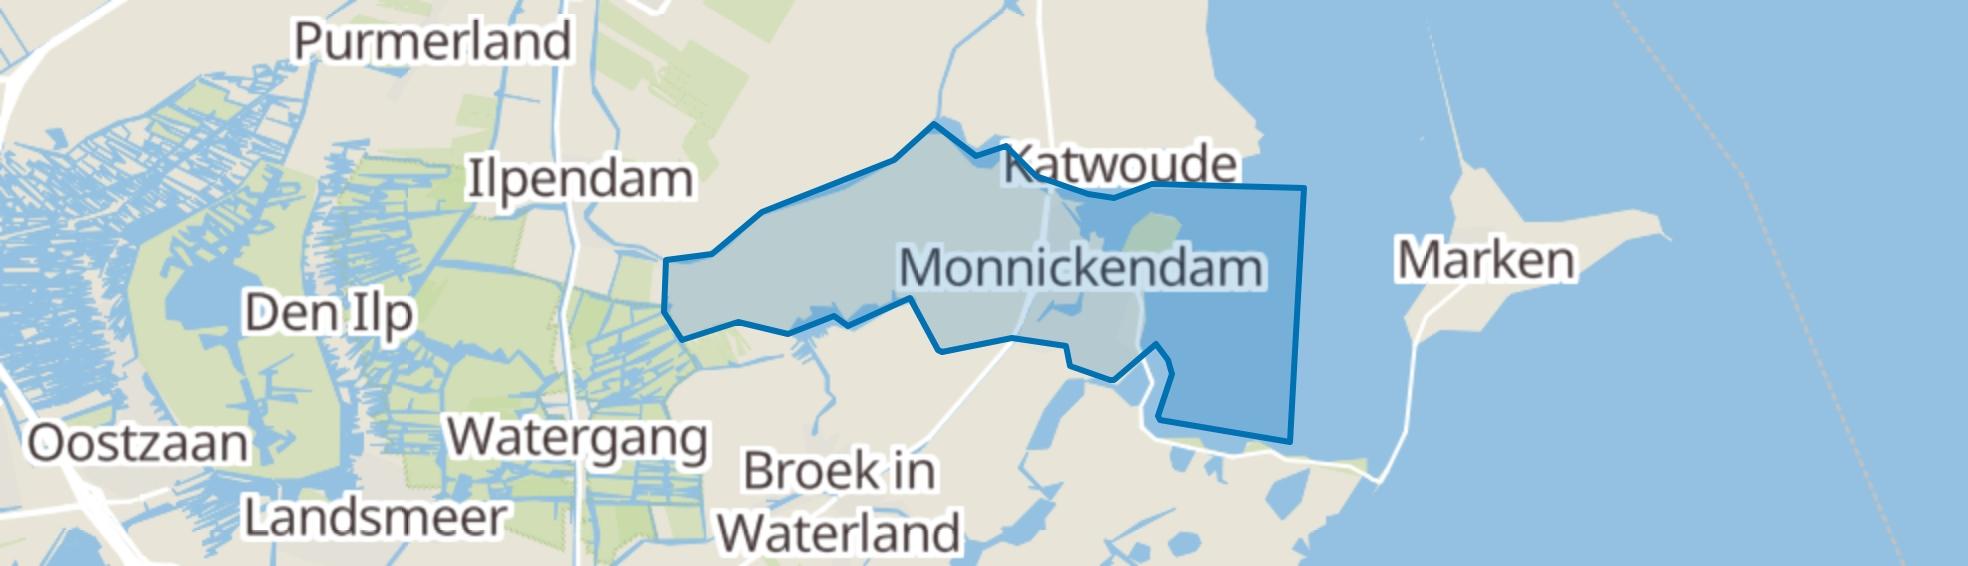 Monnickendam map